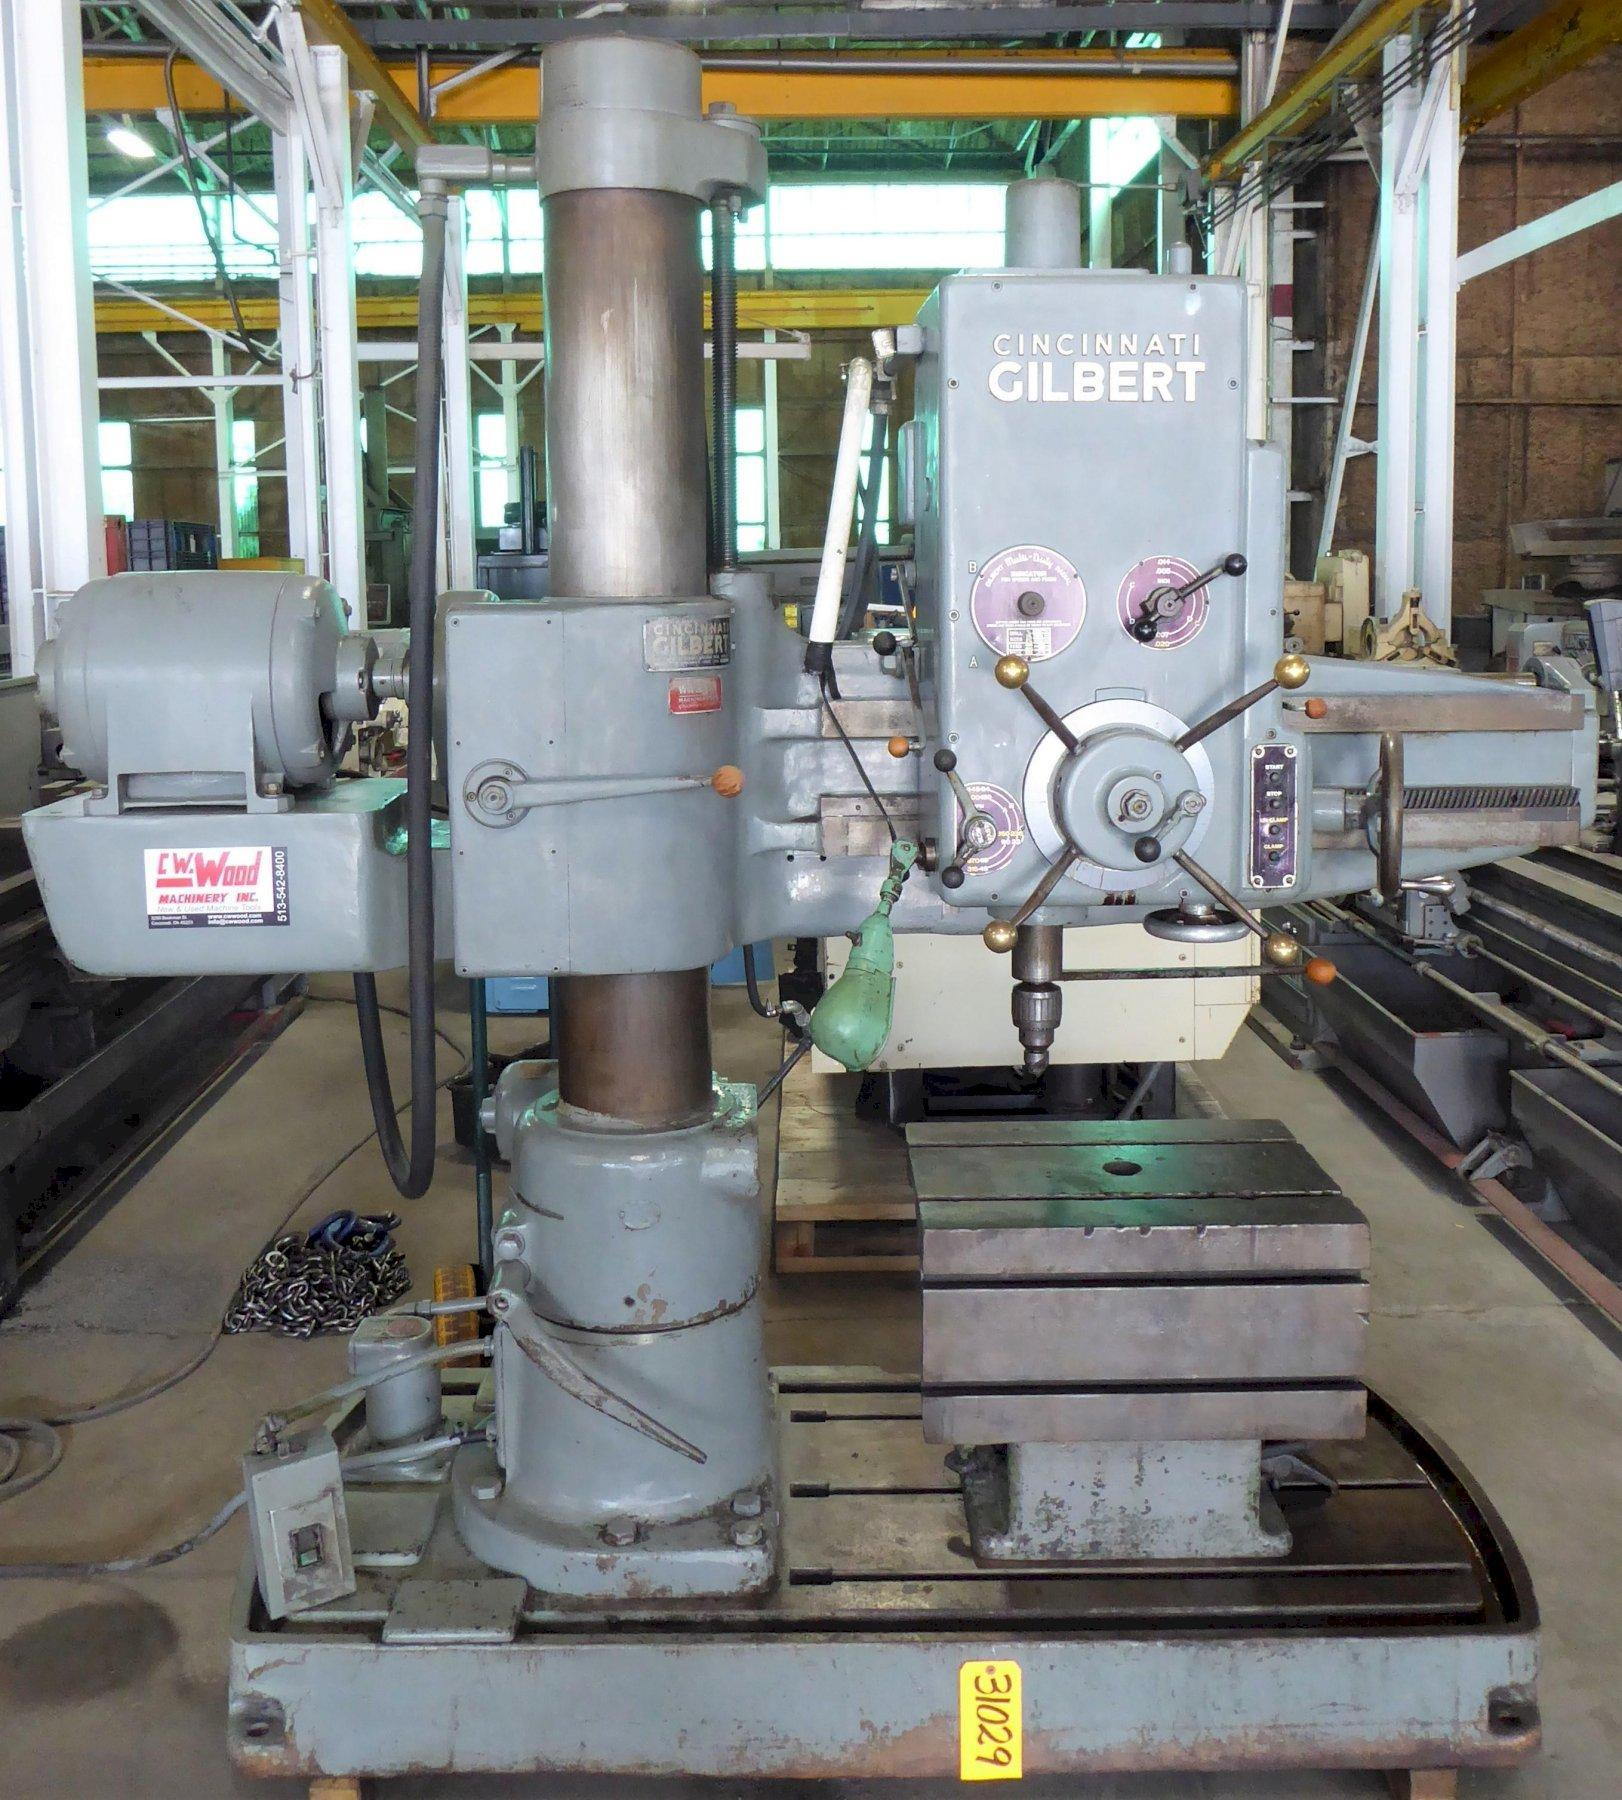 3′ x 9″ Cincinnati-Gilbert Radial Drill, Box Table, 5 HP